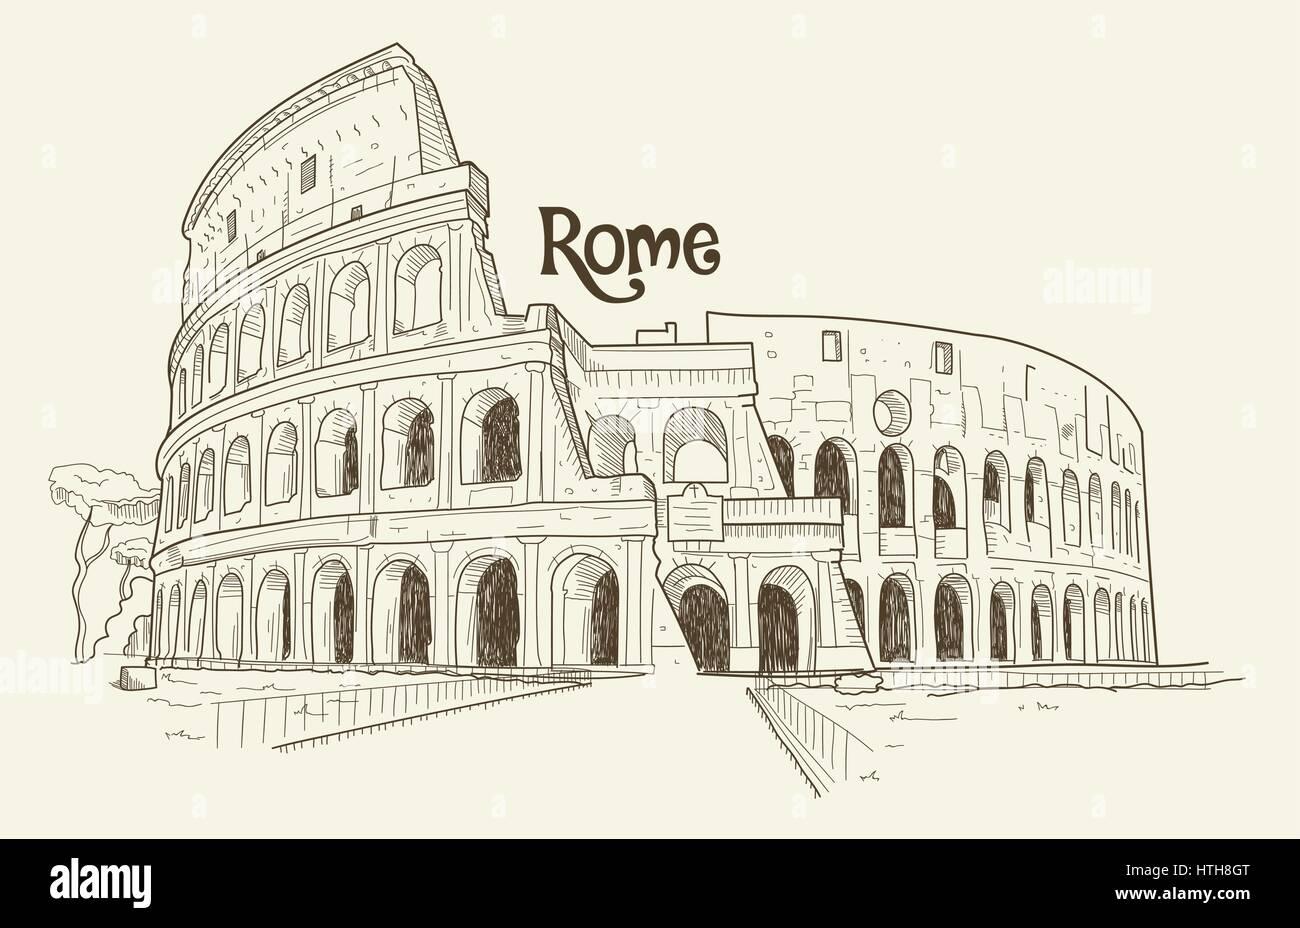 Colosseum, Vector Illustration, Hand Drawn, Sketch Stock